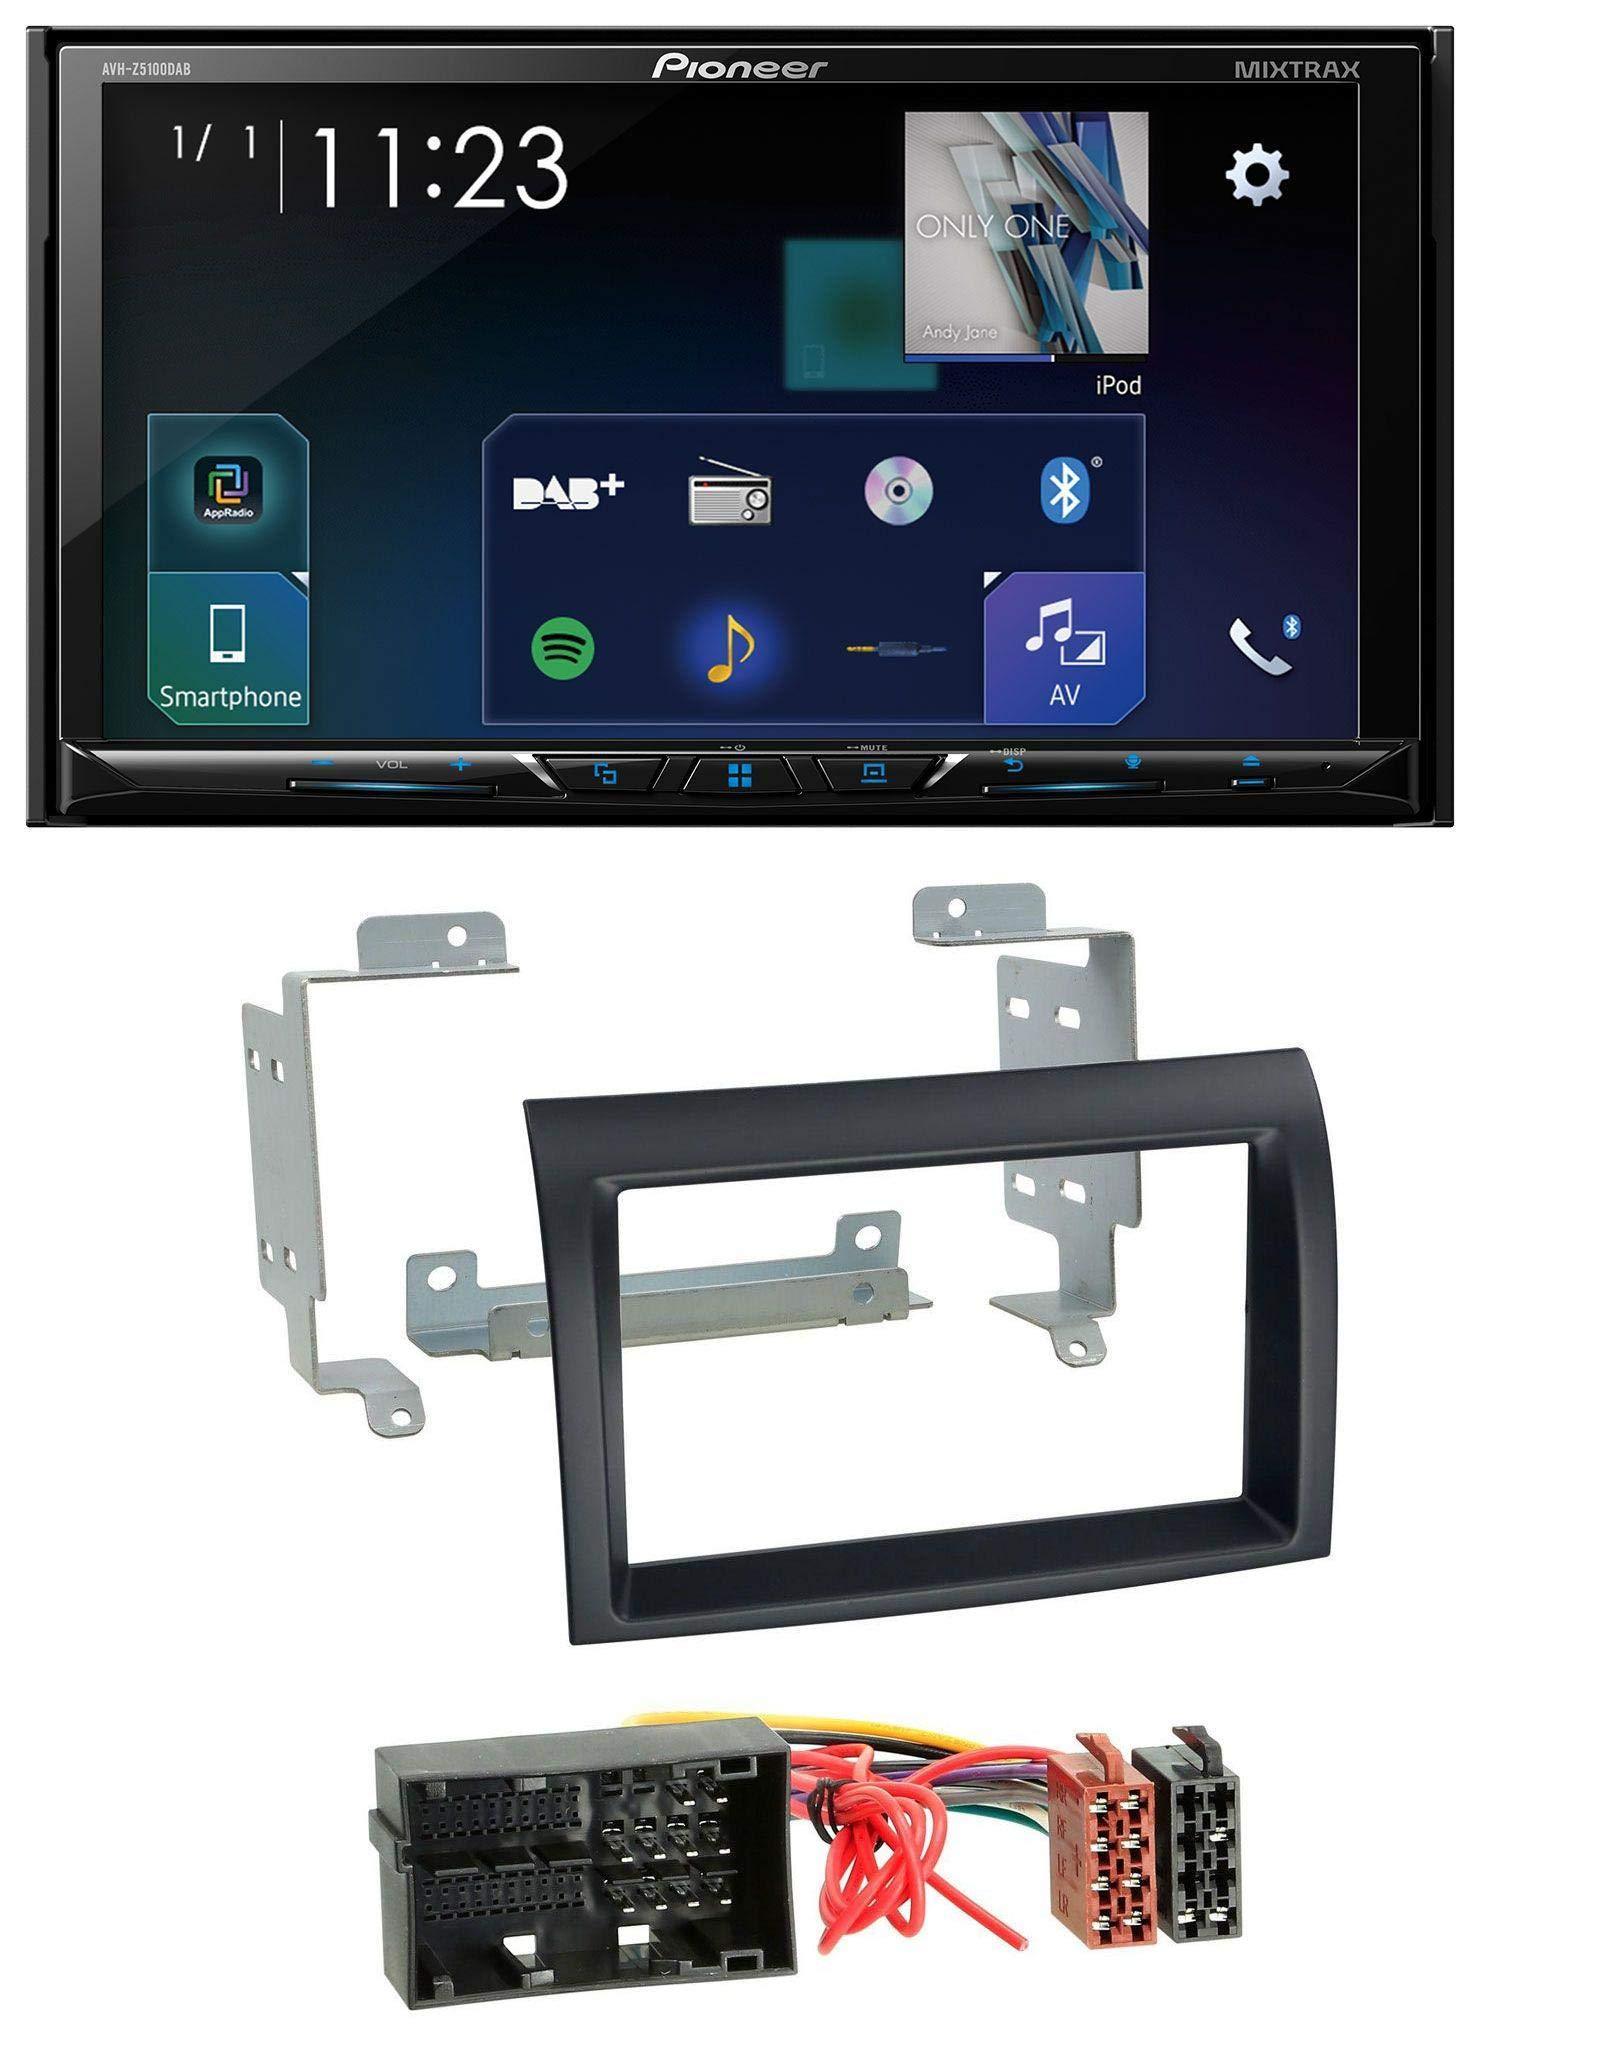 caraudio24-Pioneer-AVH-Z5100DAB-Bluetooth-DVD-MP3-USB-DAB-2DIN-Autoradio-fr-Citroen-Jumper-FIAT-Ducato-Peugeot-Boxer-Quadlock